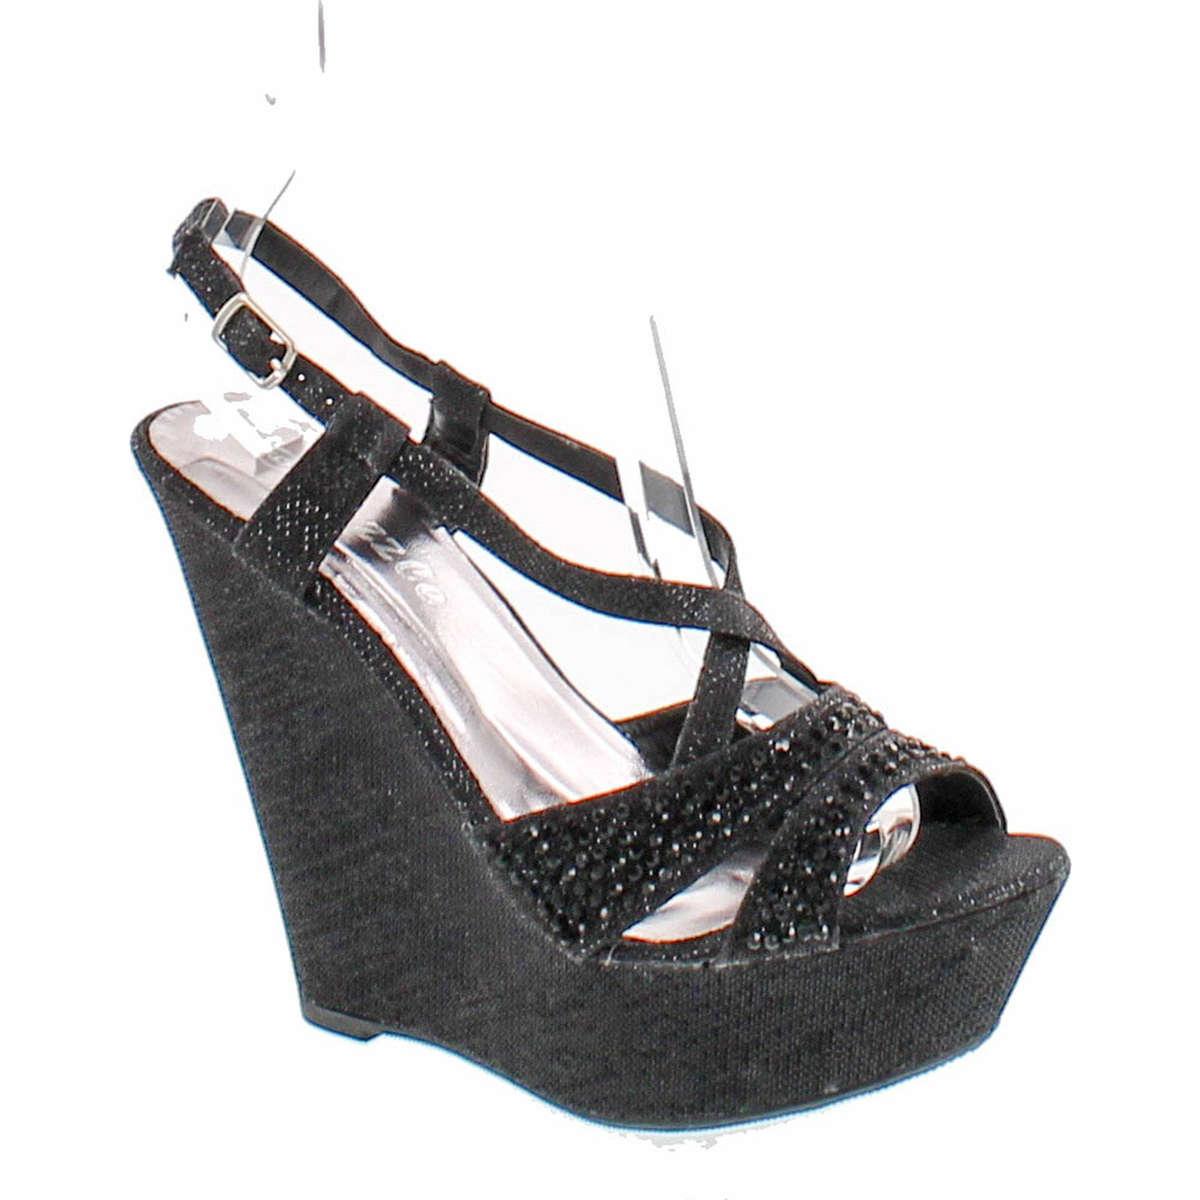 4c5b39b34e70 Bella Luna Emmy-10 Women s Open Toe Slingback Platform Strap Wedge Sandals  - ShoeCenter.com